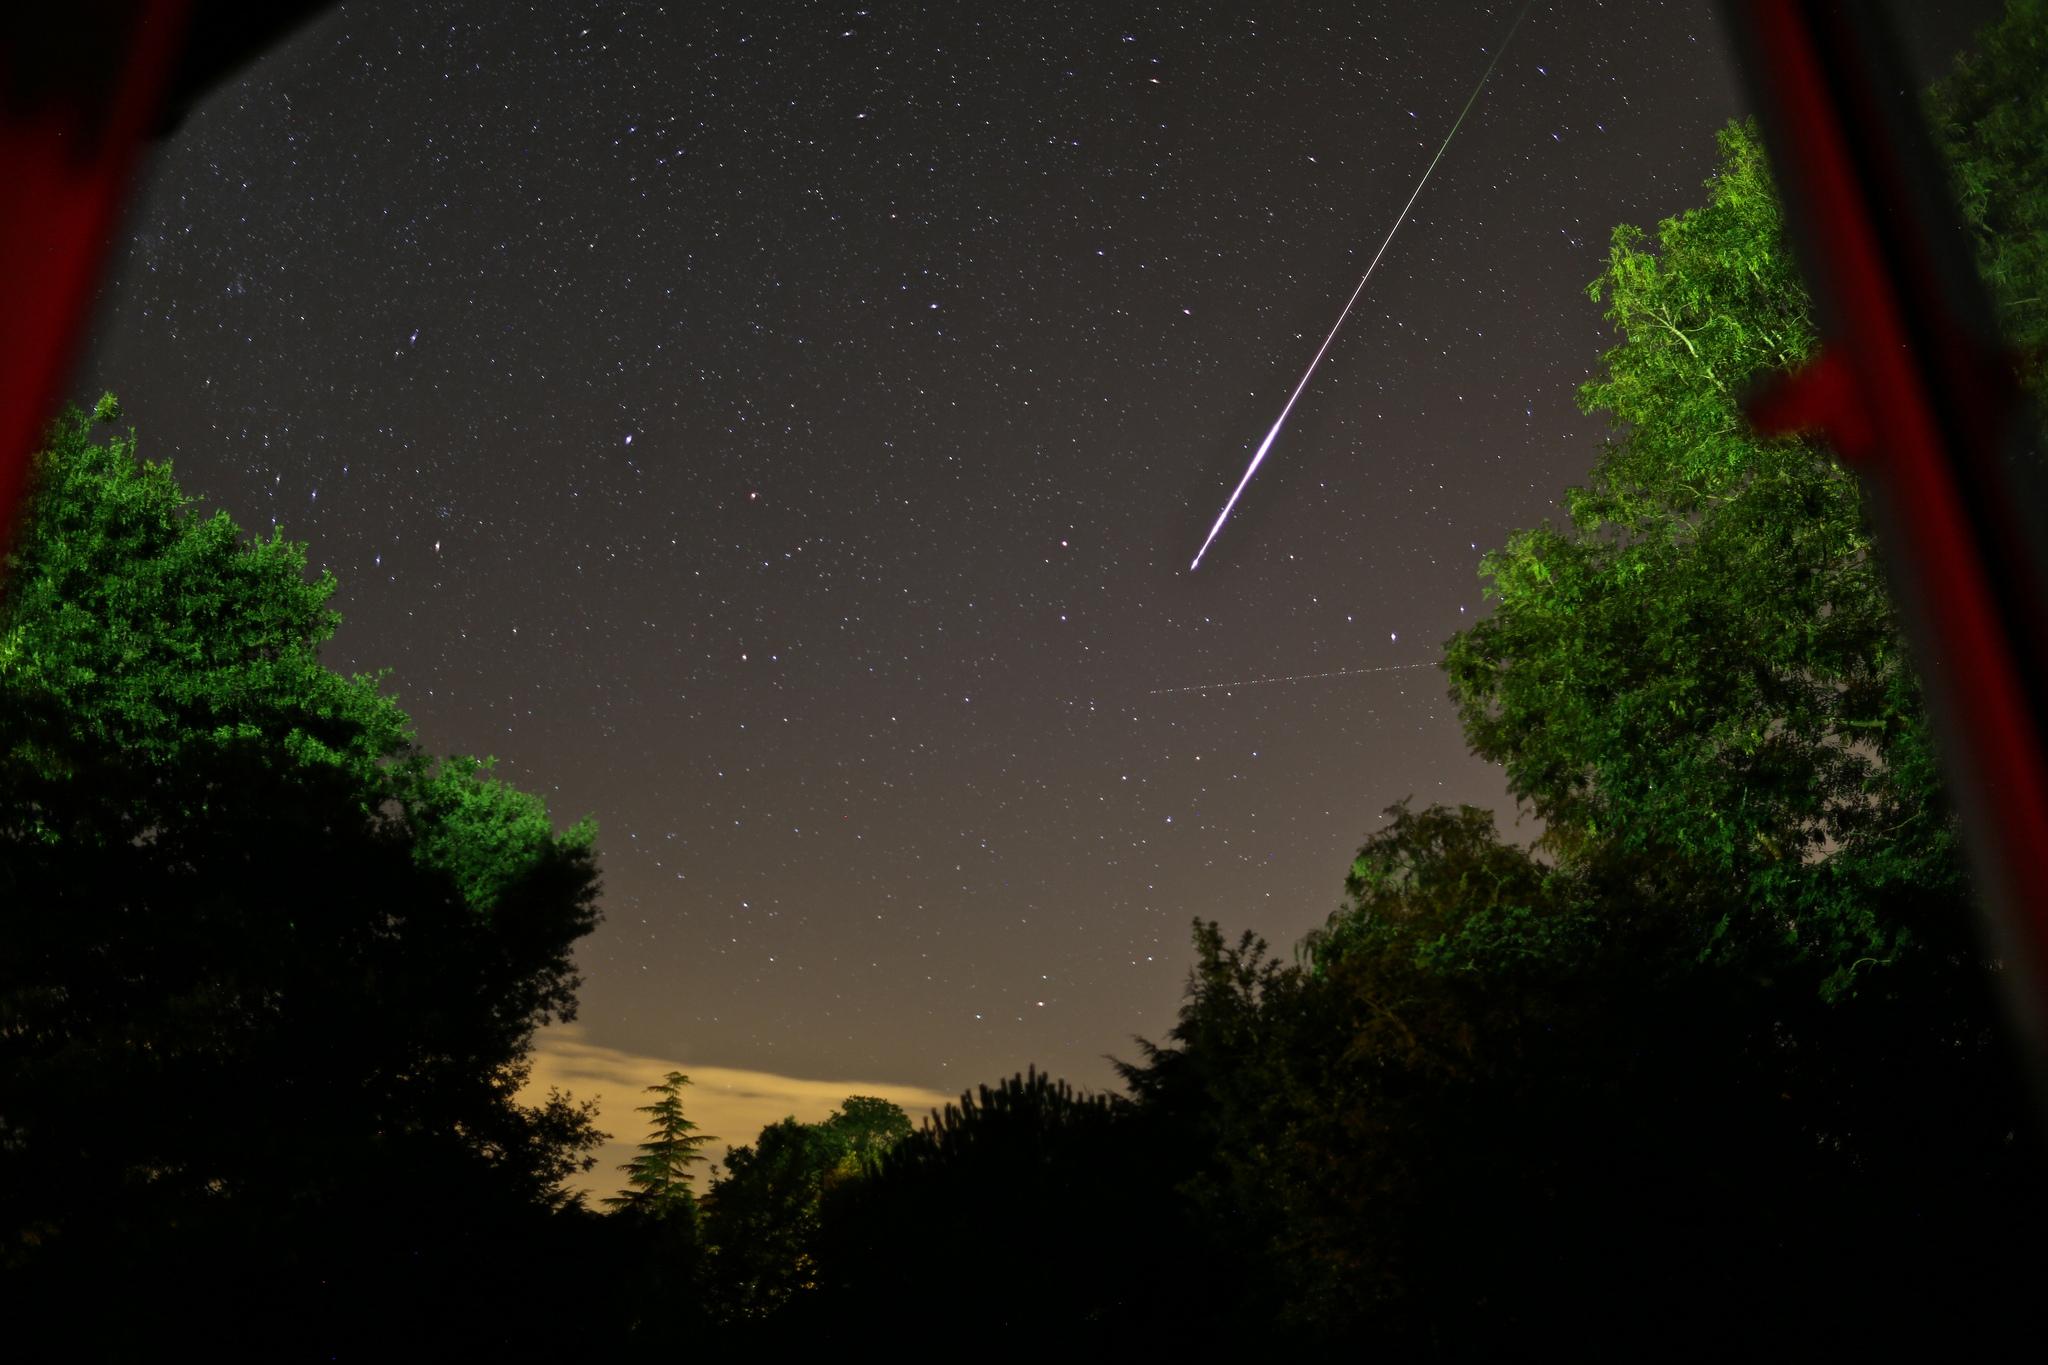 Perseid Meteor, courtesy of Kathryn Alberts